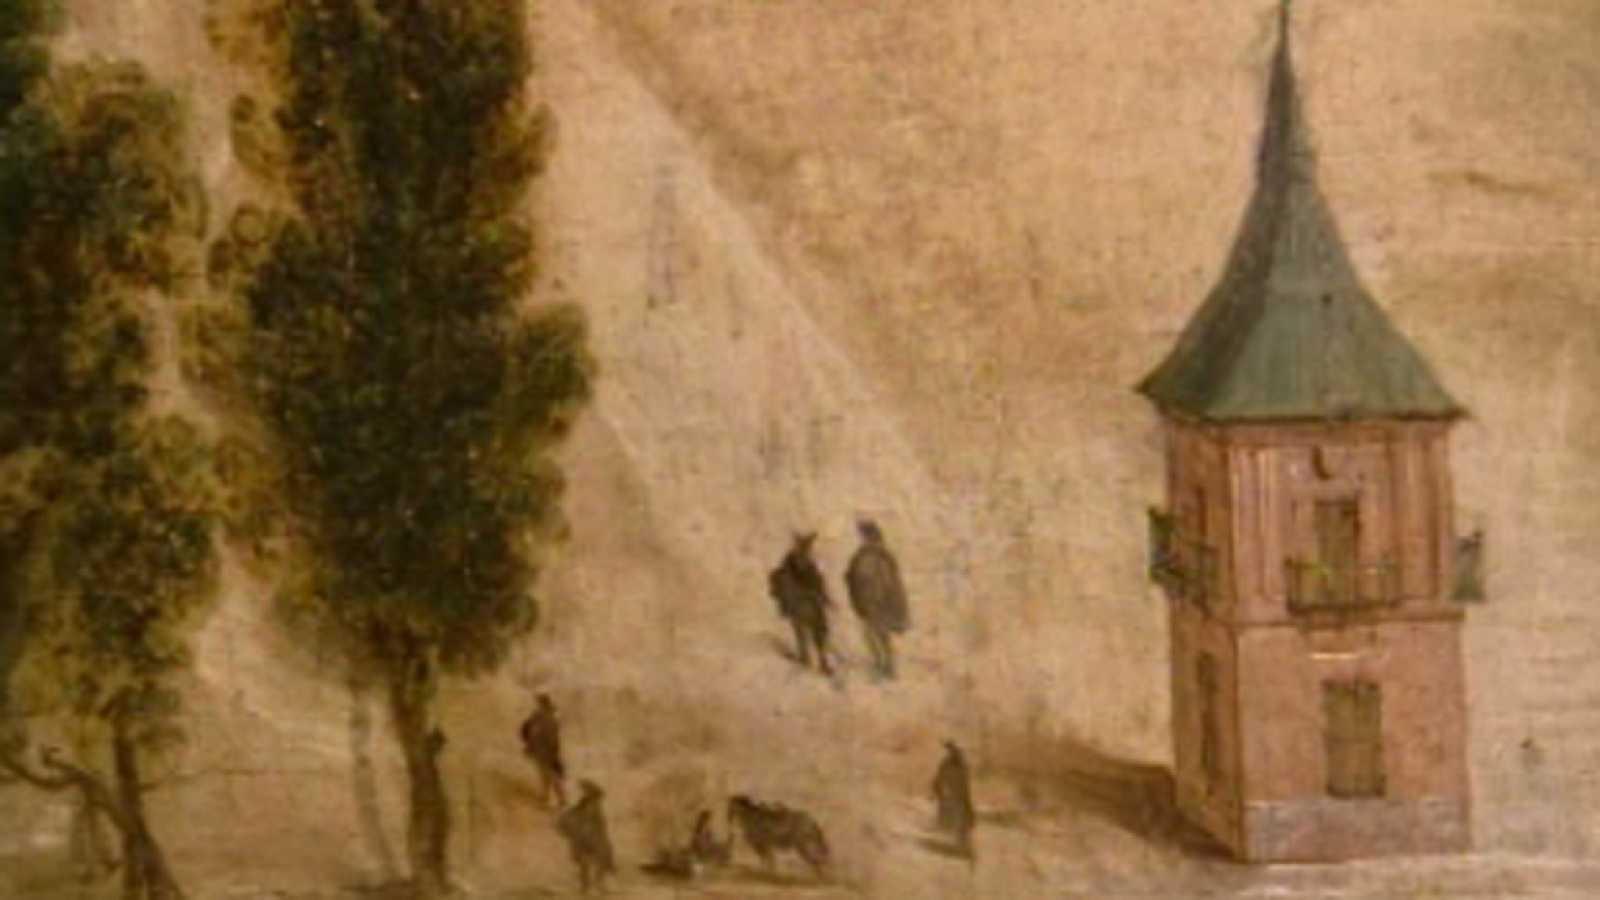 Informe semanal - Felipe IV, pasión por el arte